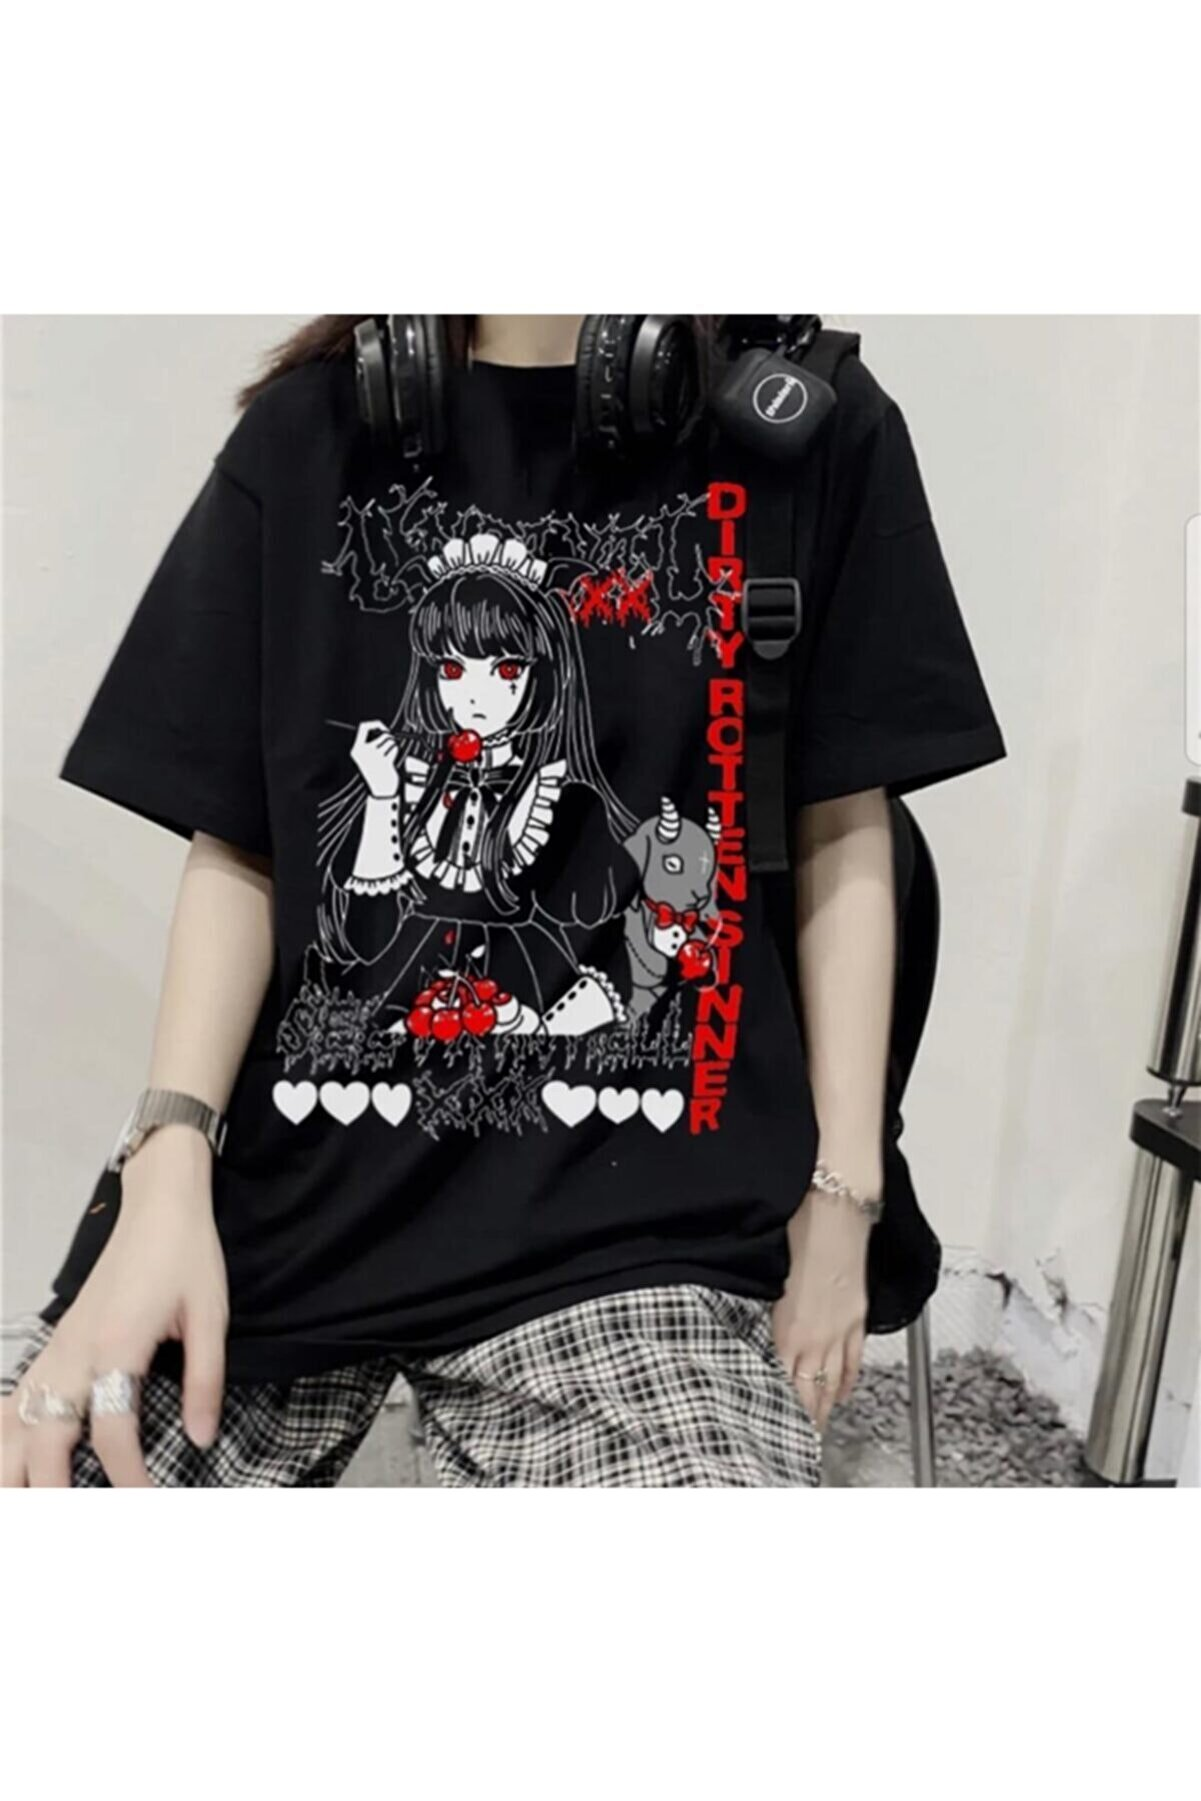 Köstebek Unisex Harajuku Anime Punk T-Shirt